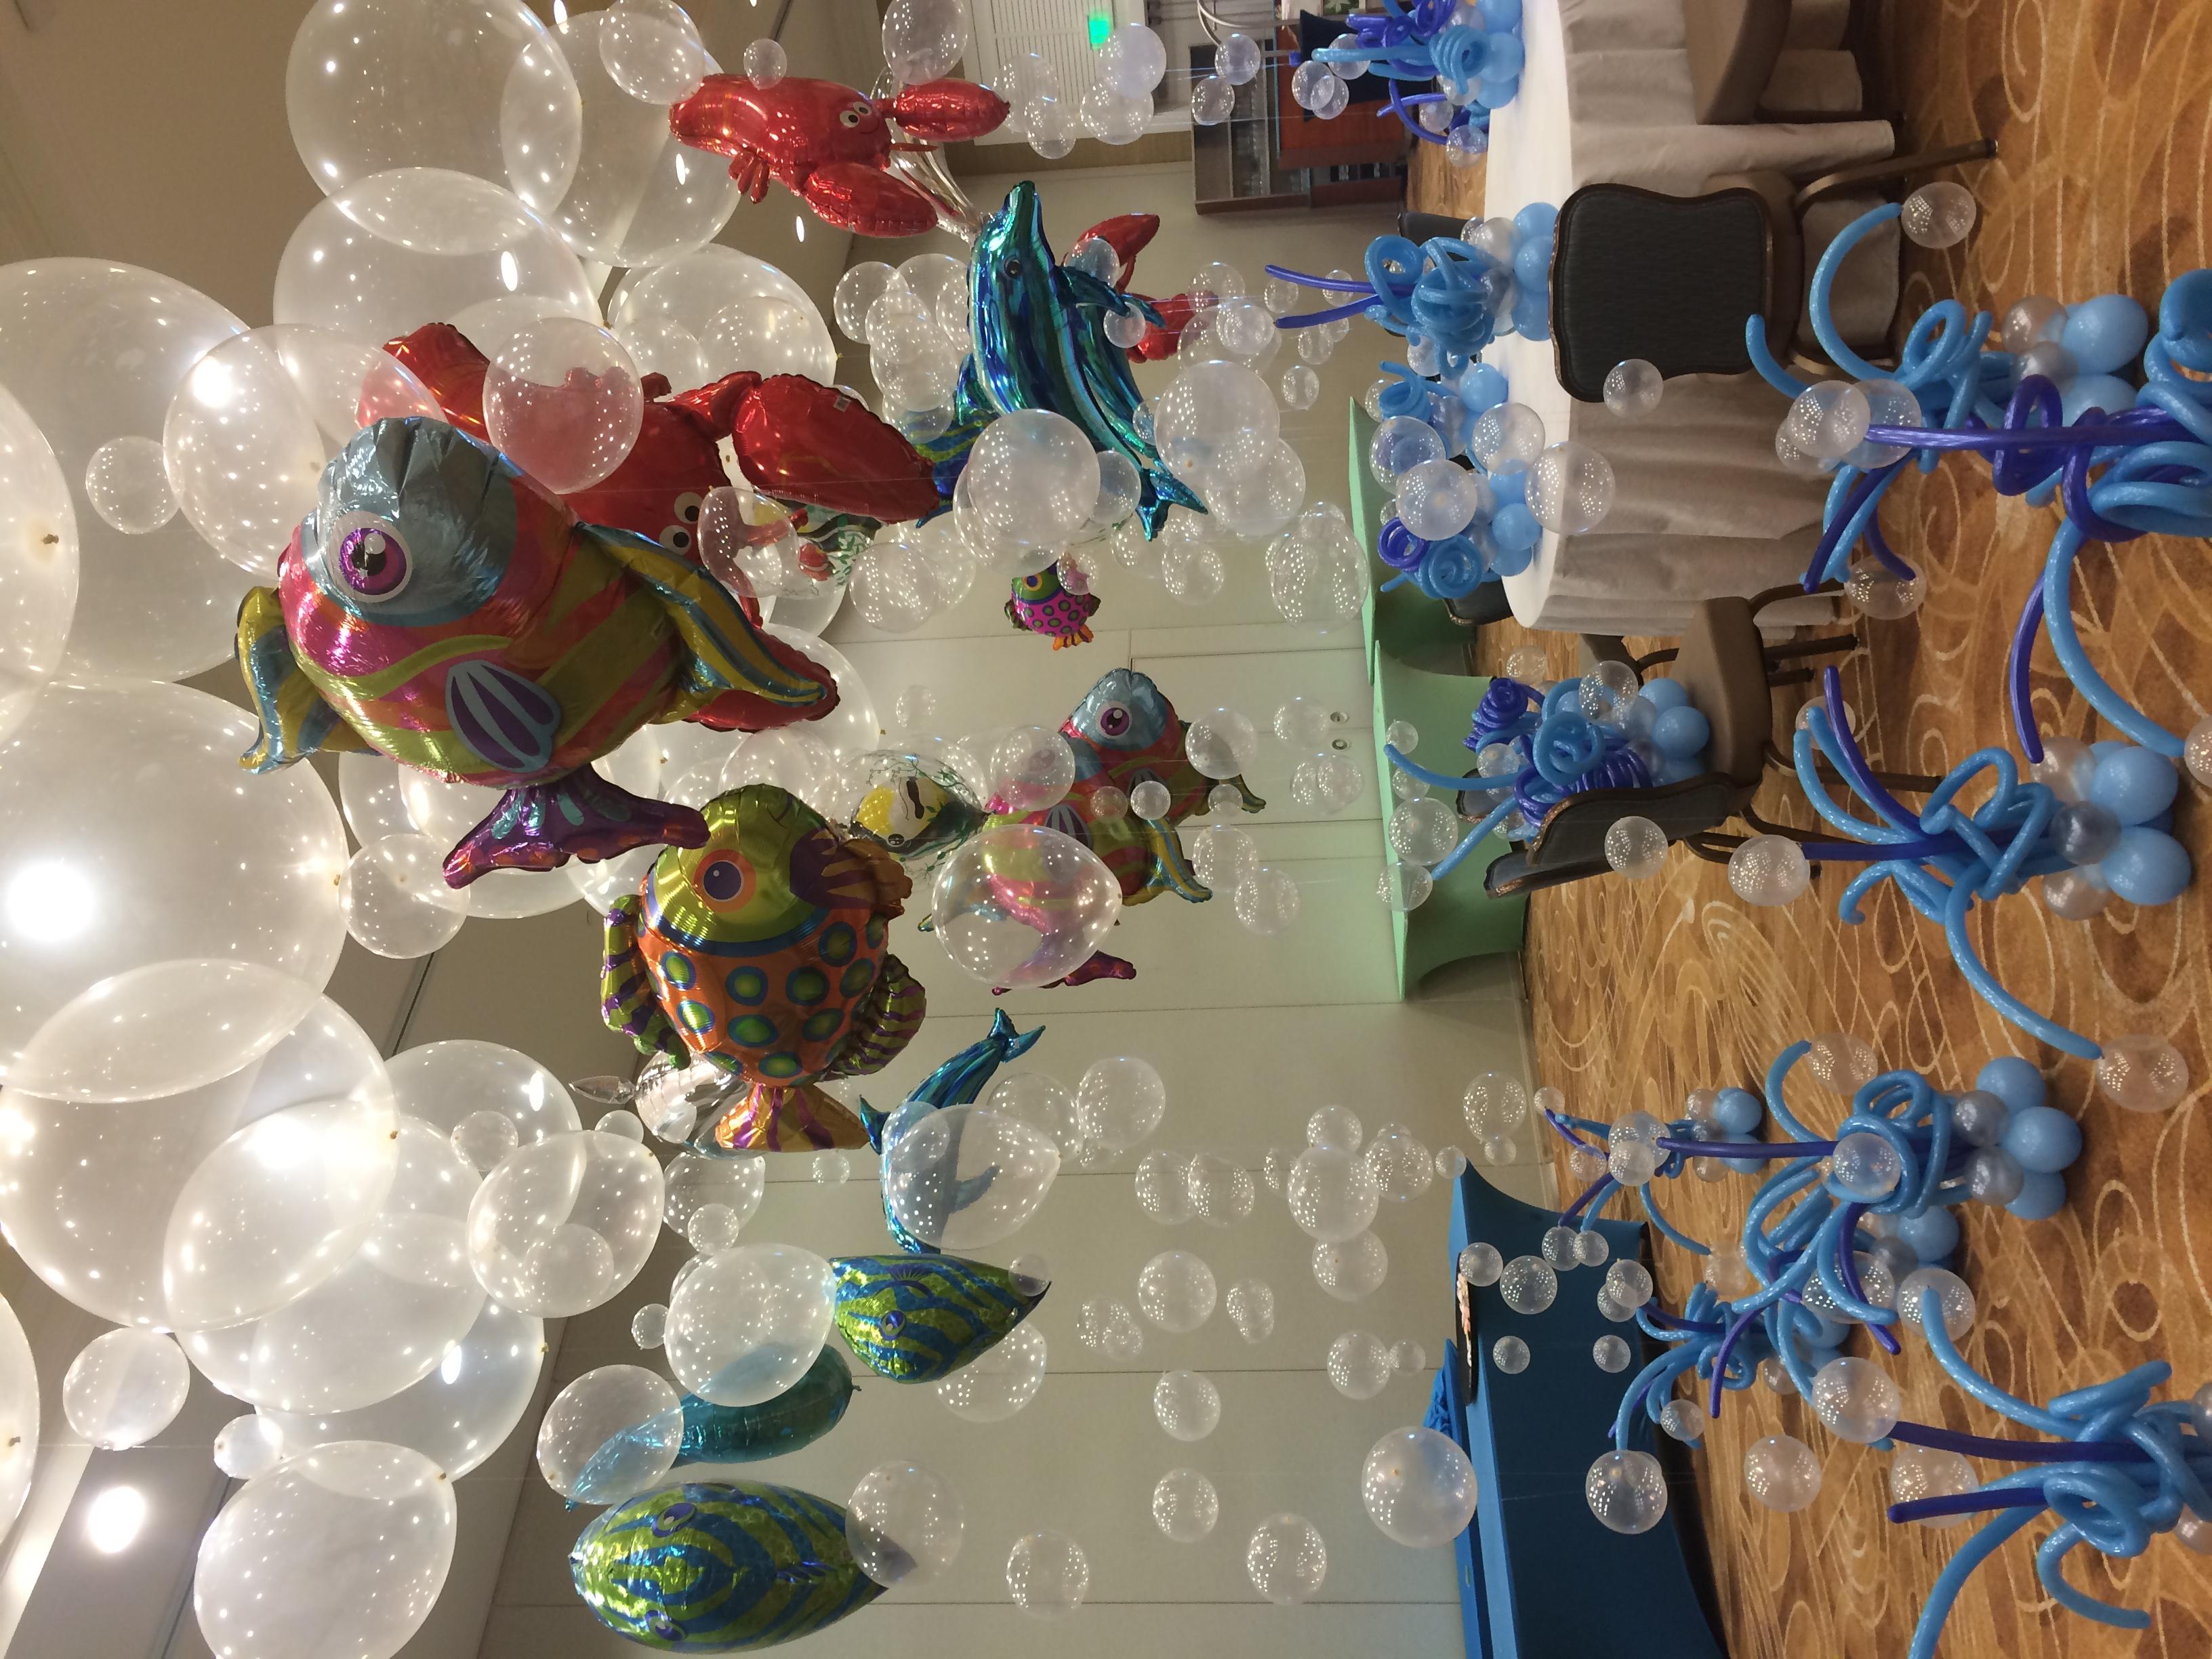 Balloon Bubble & Fish Centerpiece